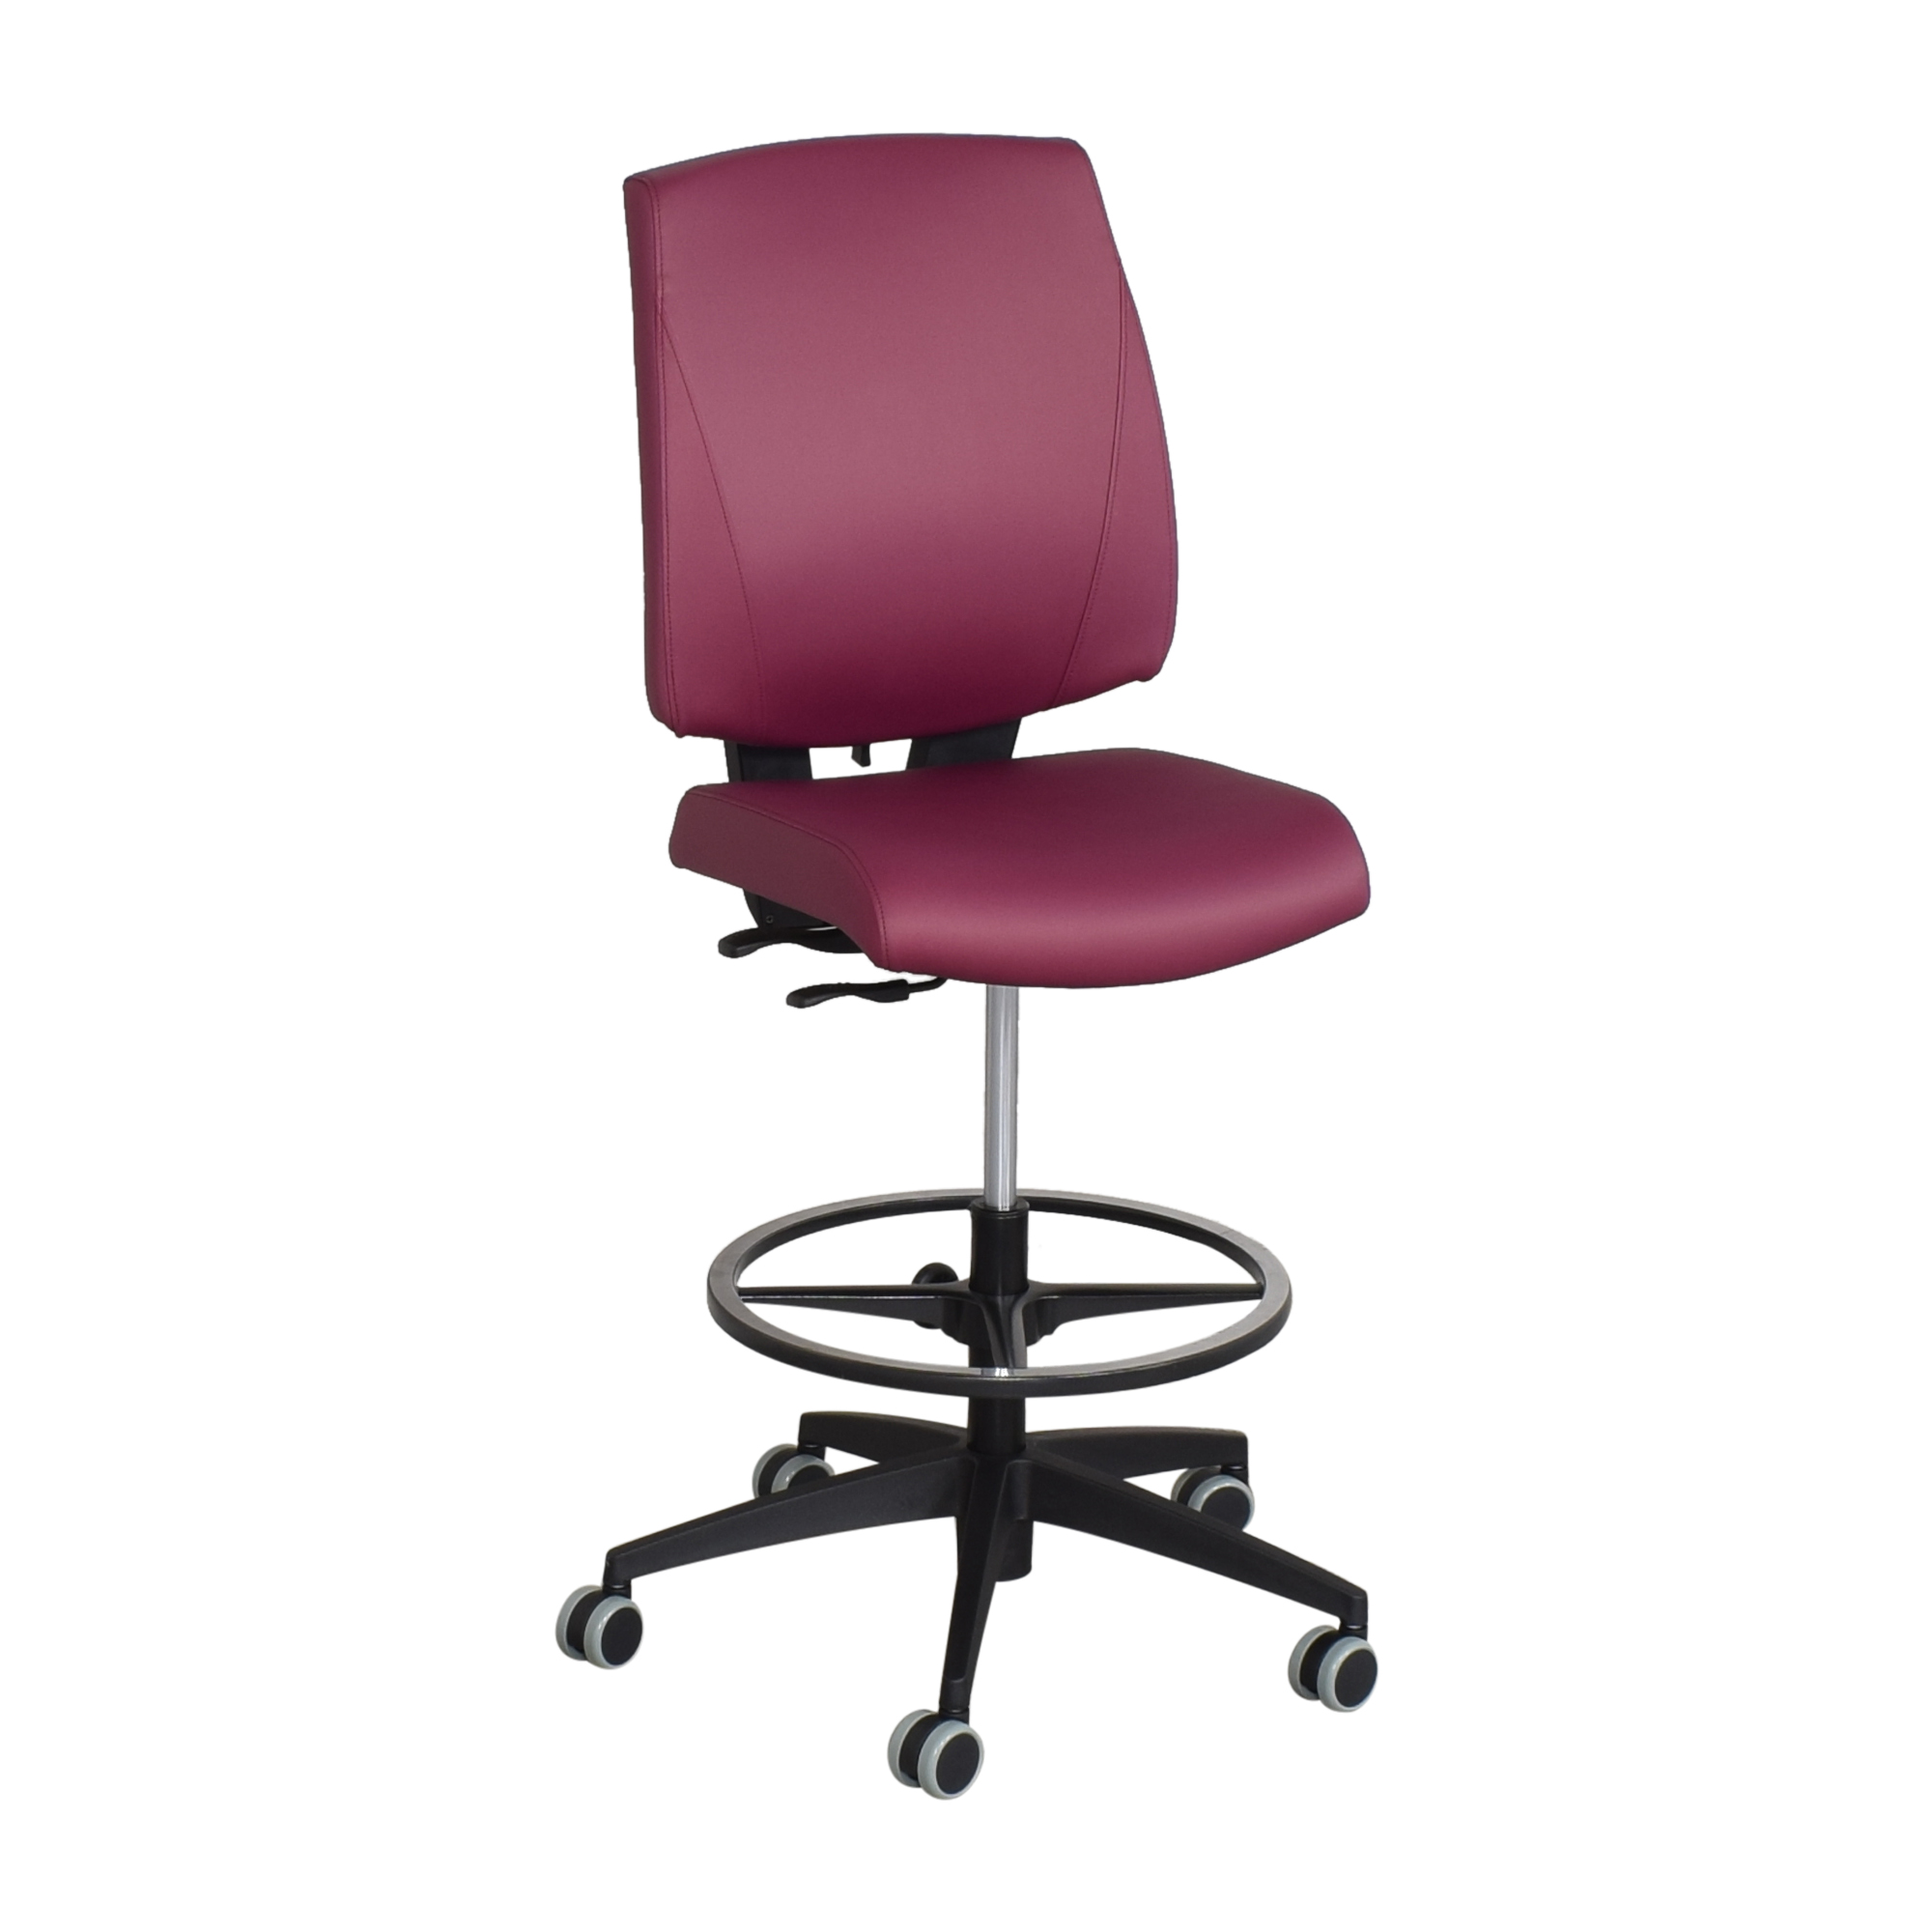 Global Furniture Group Global Furniture Group G1 Ergo Select Drafting Stool pa